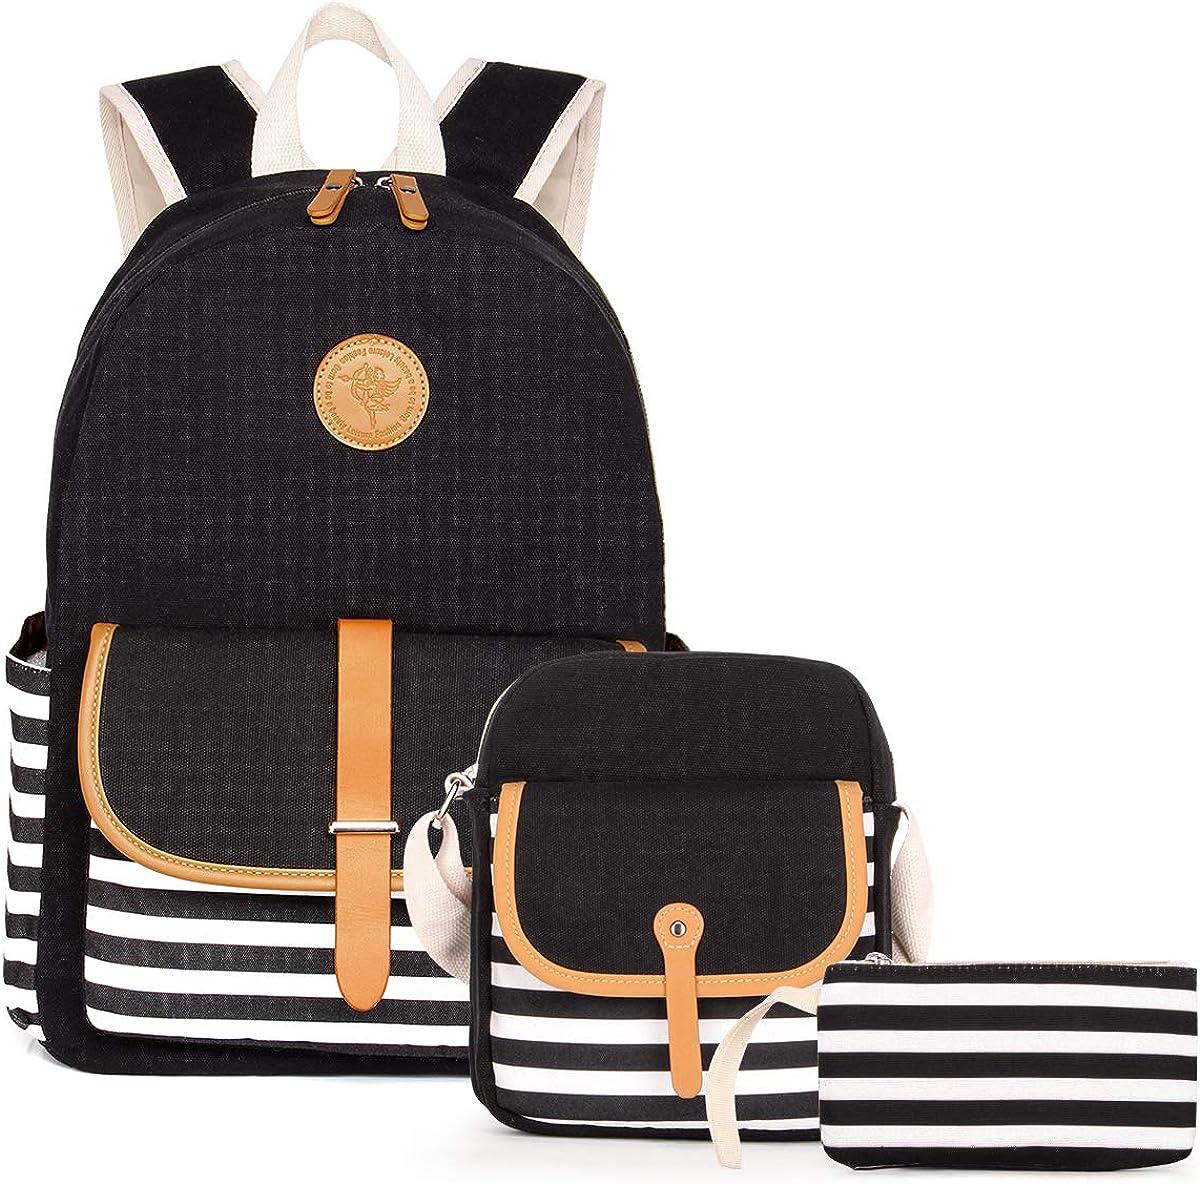 "3pcs Canvas School Backpacks Bookbags Sets for Teen Girls Black Striped Bookbags Travel Backpack for 14"" Laptop"